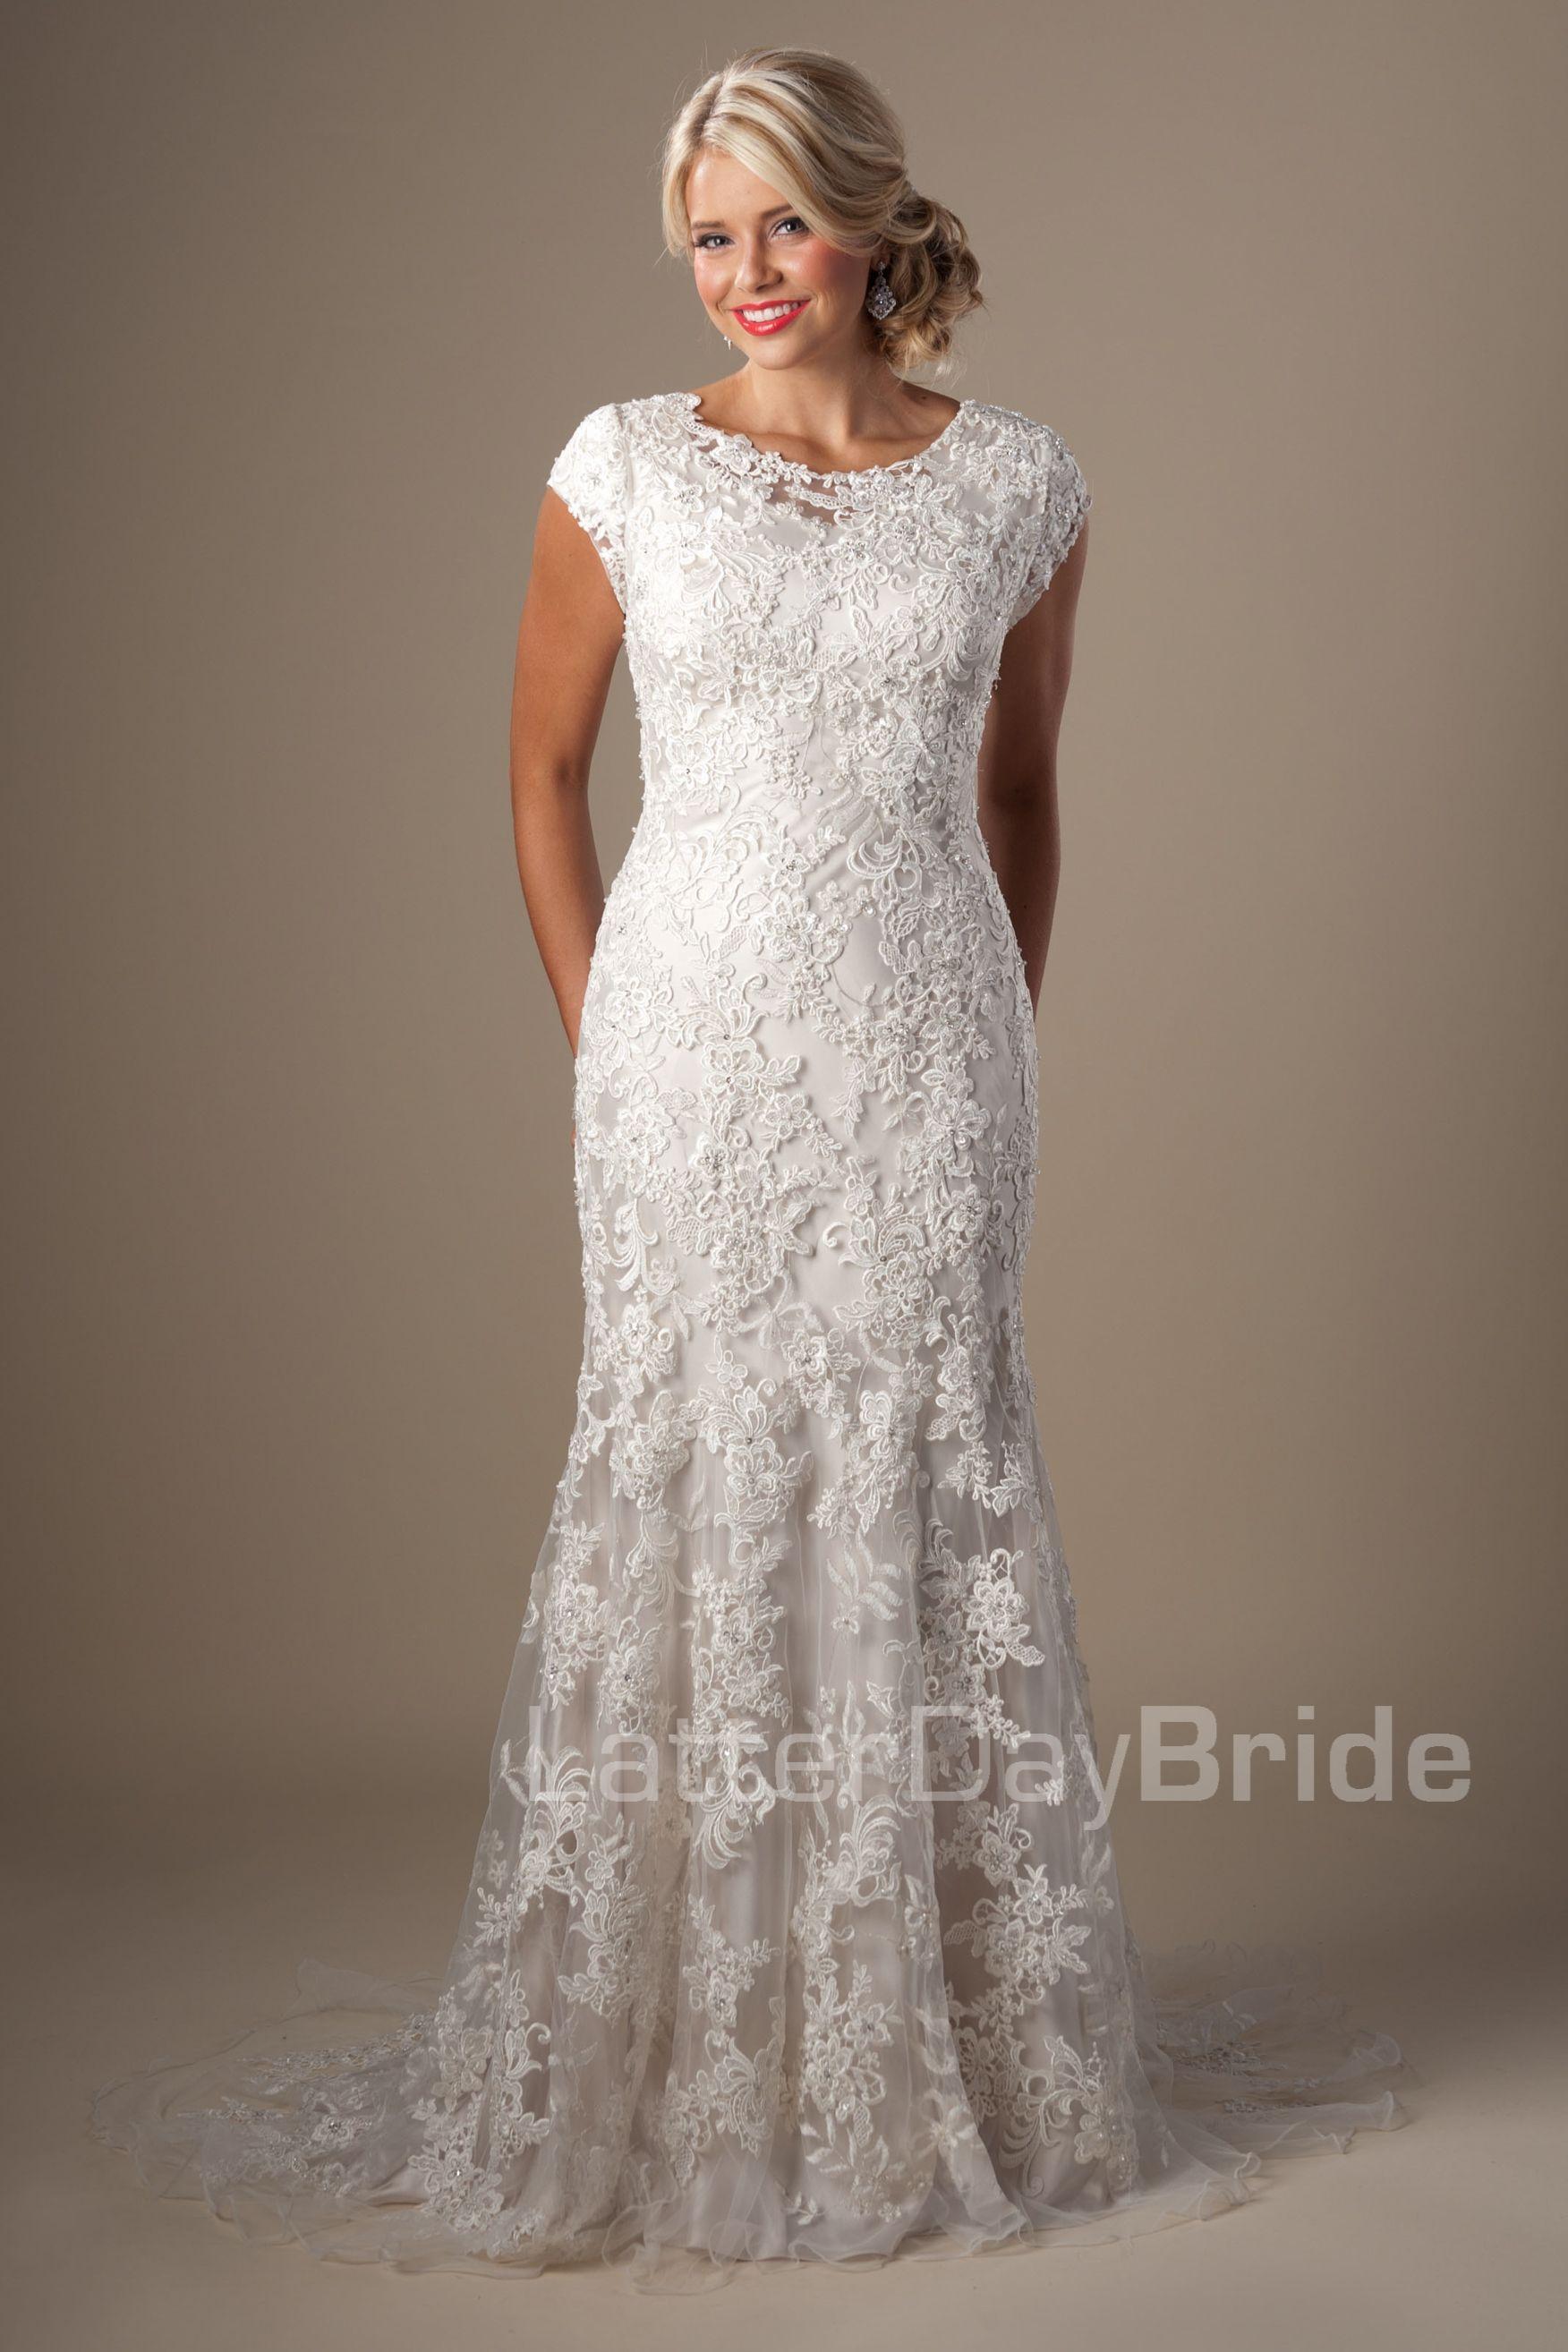 Modest wedding dresses latter day bride on pinterest for Modest lace wedding dresses